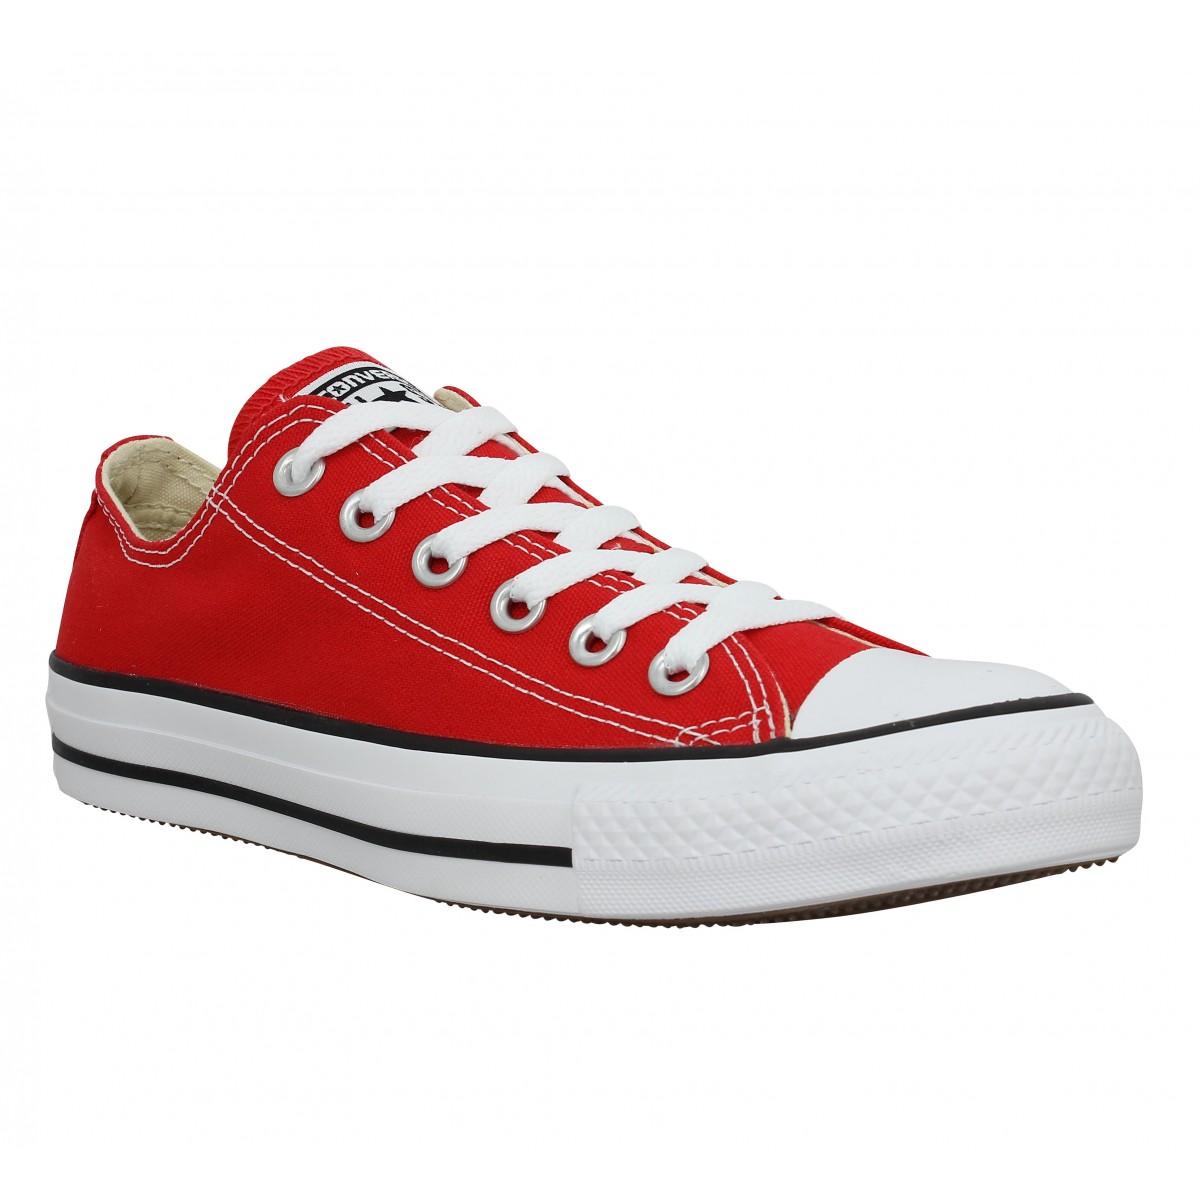 chaussures femme converse